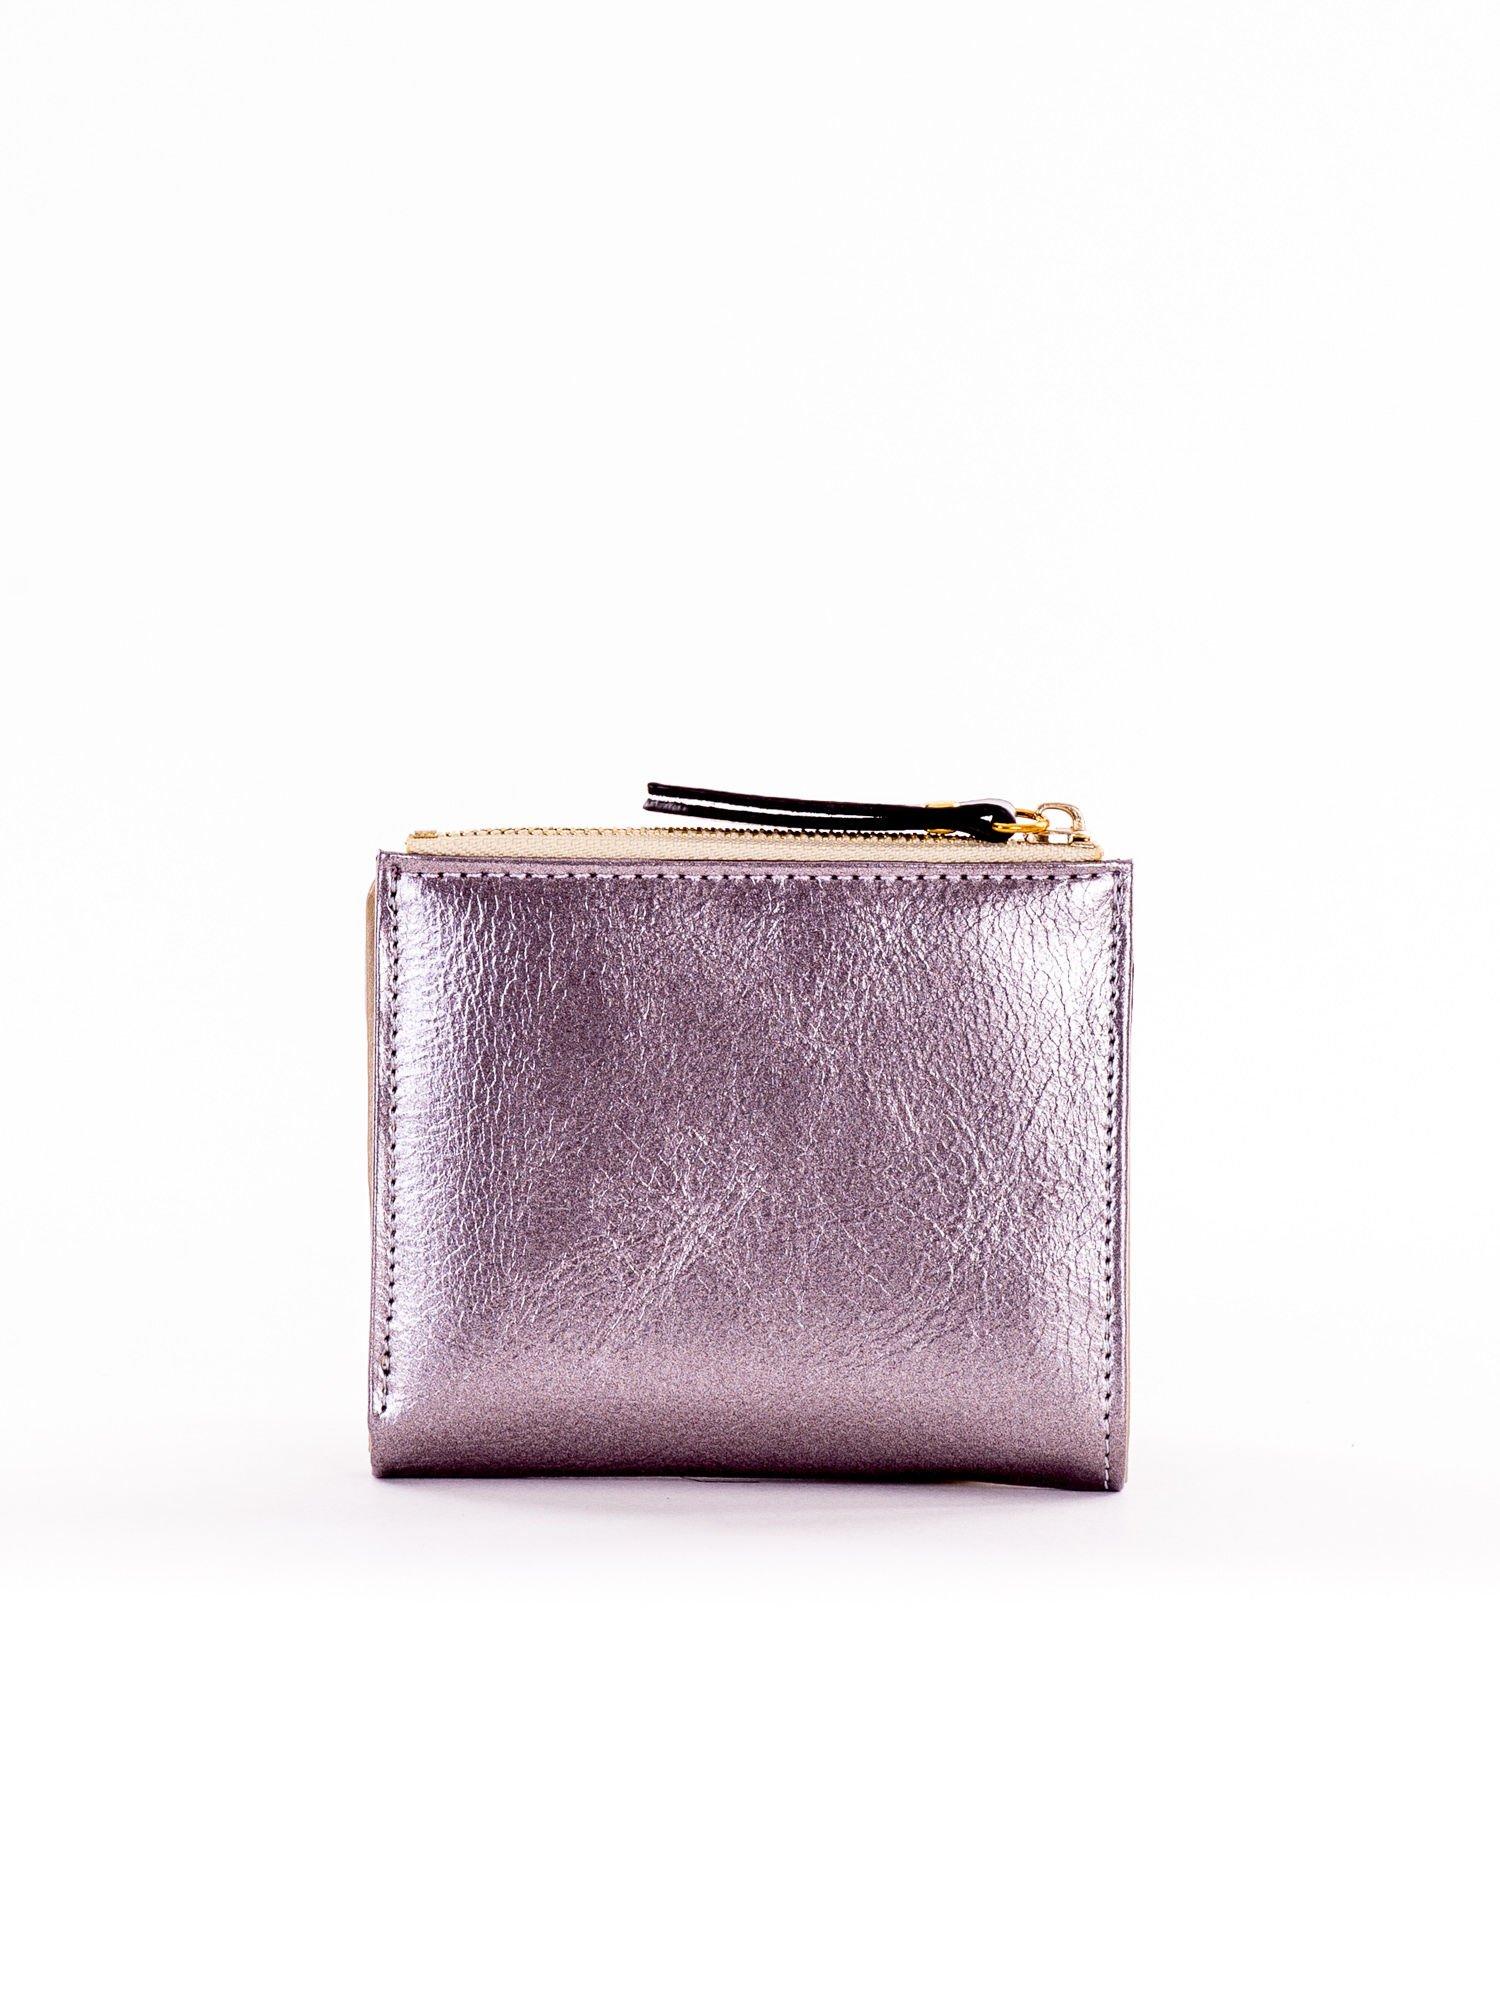 53e53a72ce275 Mały srebrny płaski portfel damski - Akcesoria portfele - sklep ...